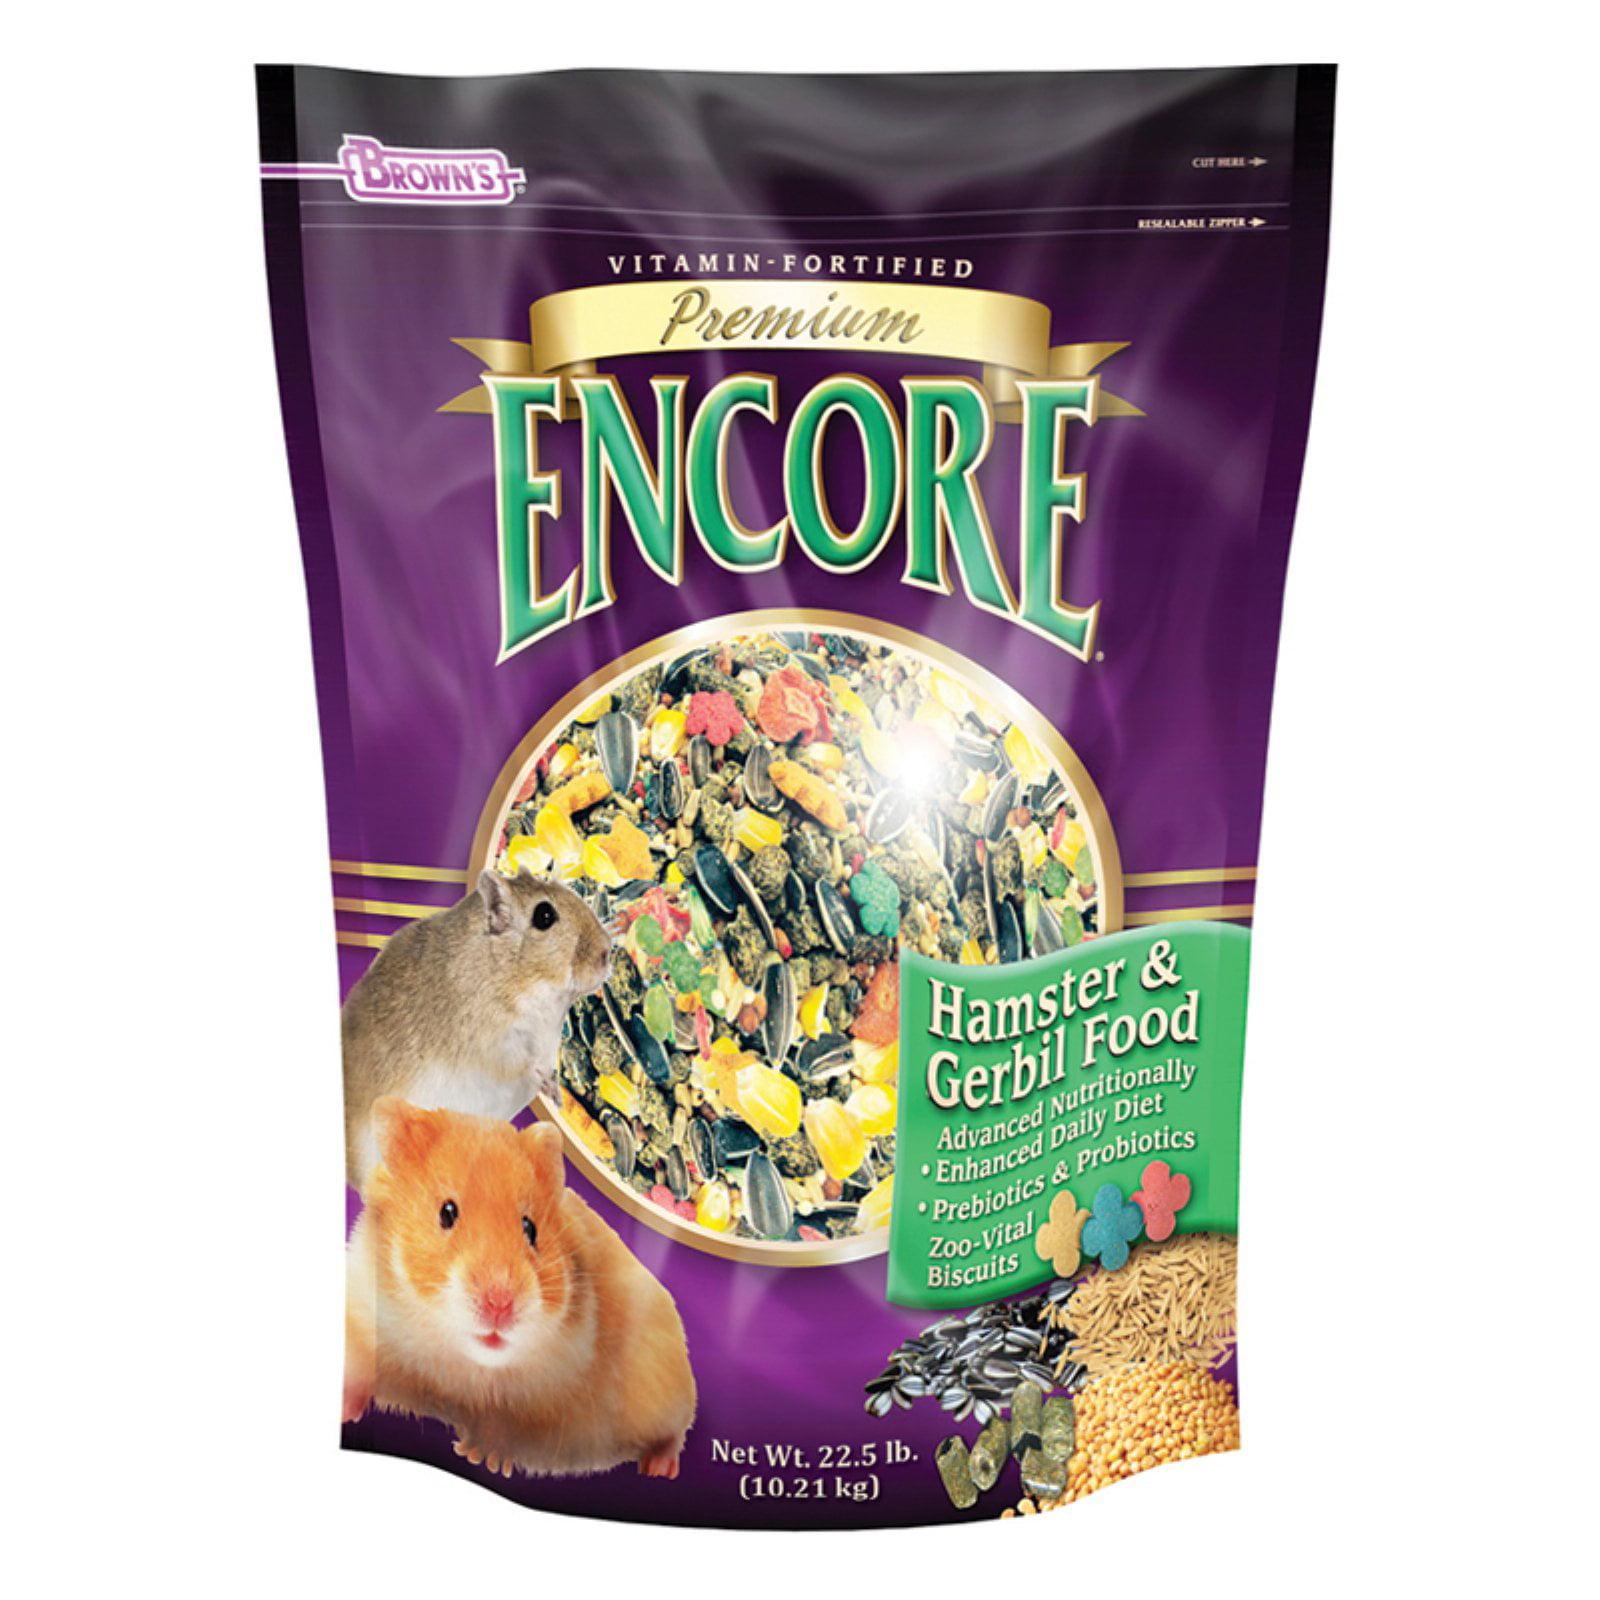 Encore Hamster Food 22.5 lb. by F.M. Browns Inc - Pet